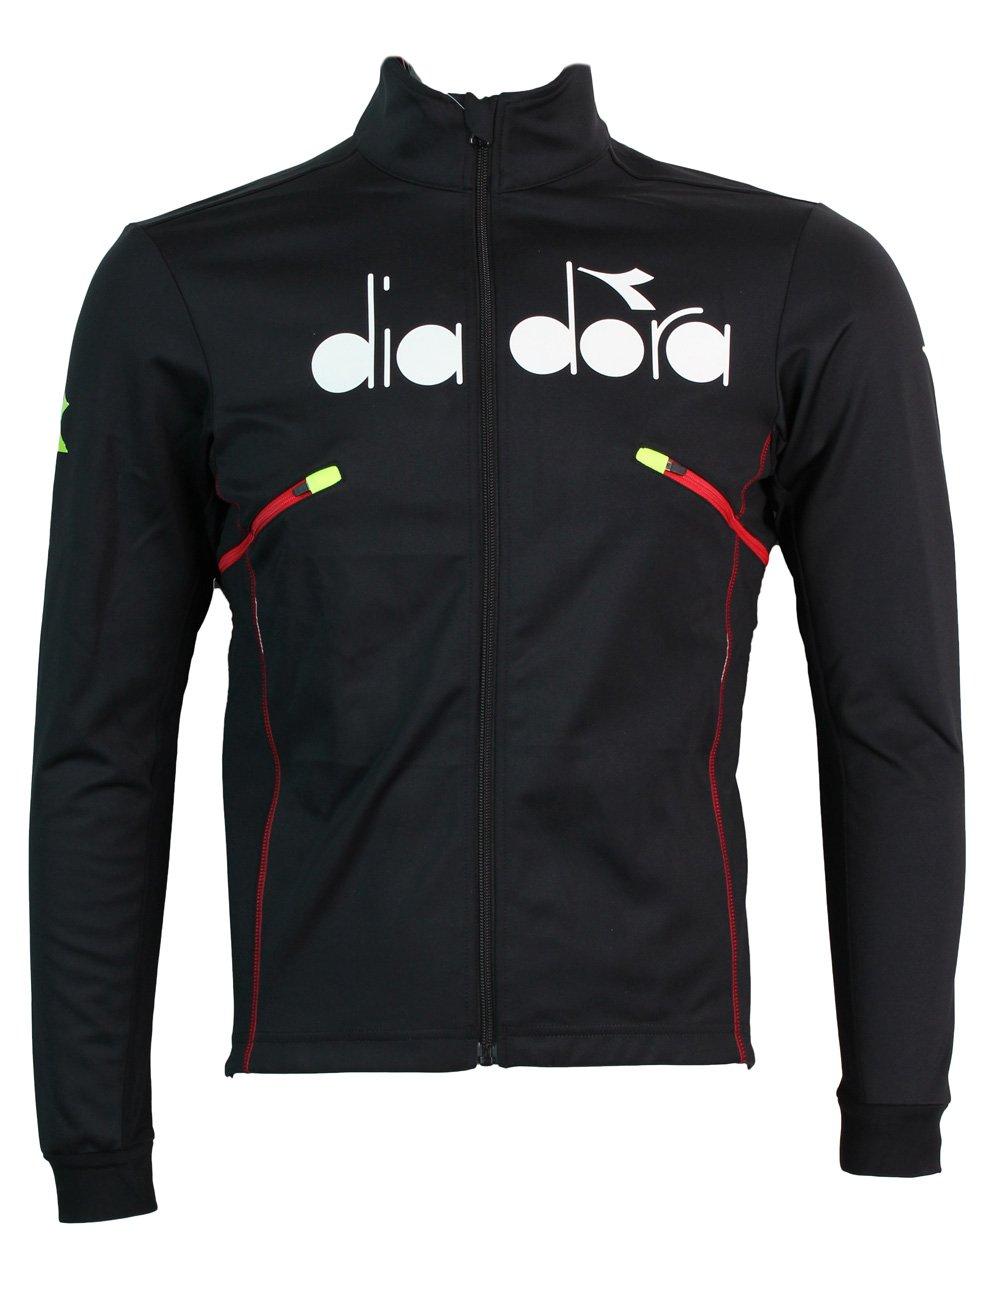 Diadora Thermojacket Retro 4D | Jakker